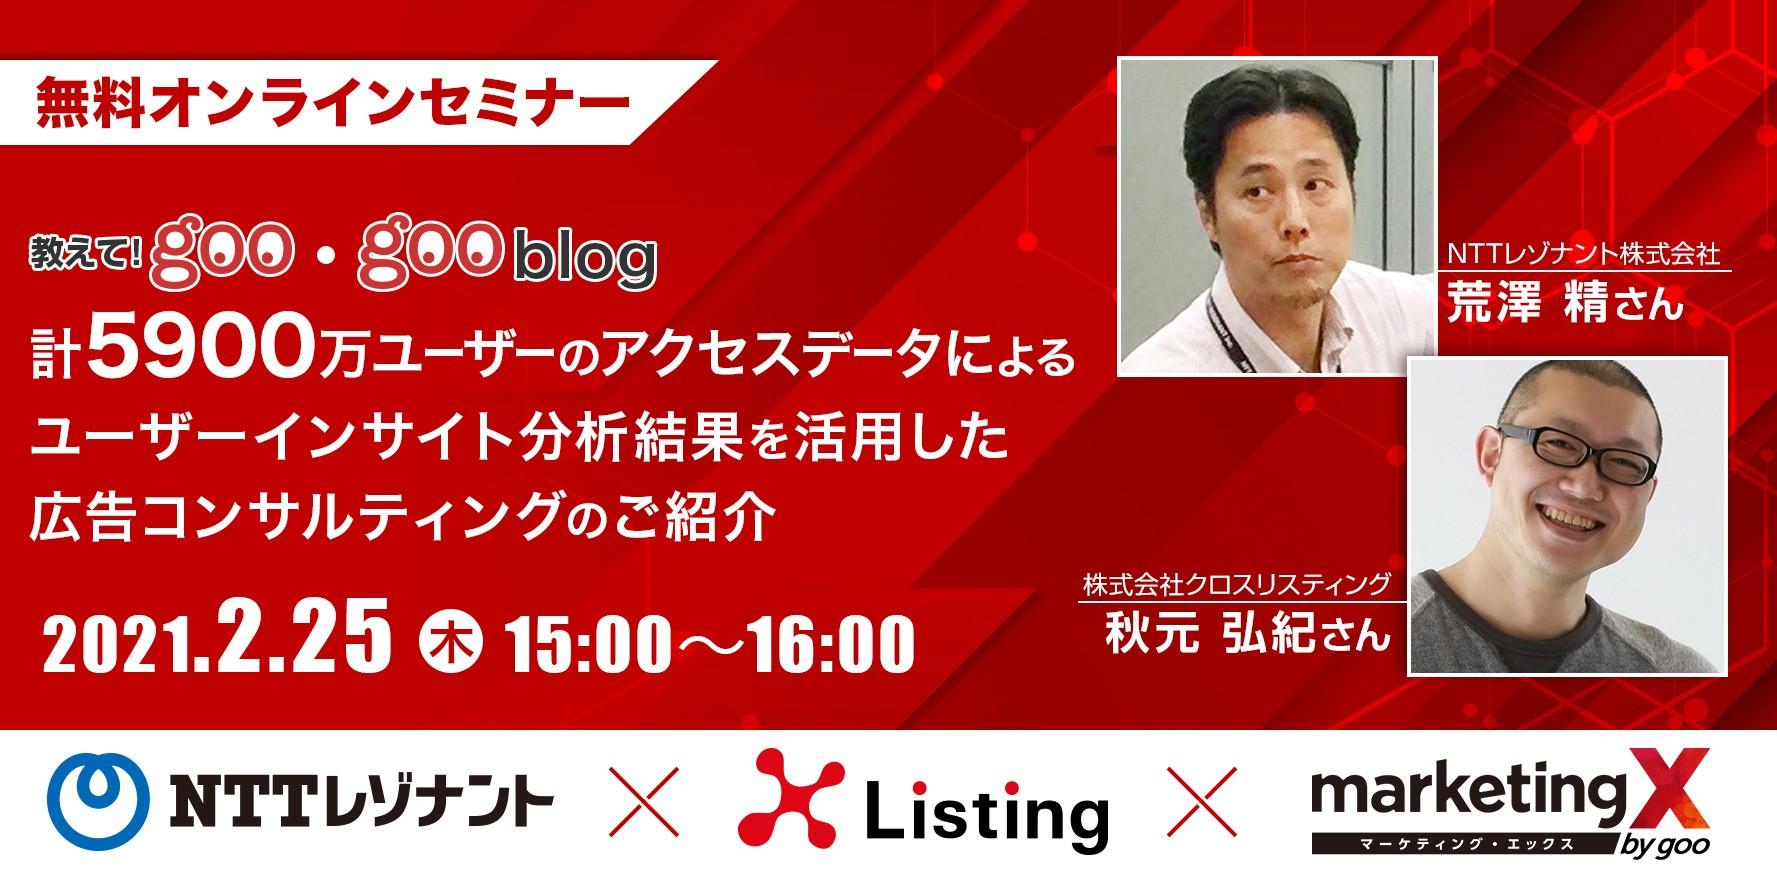 NTTレゾナント・クロスリスティング共同セミナー